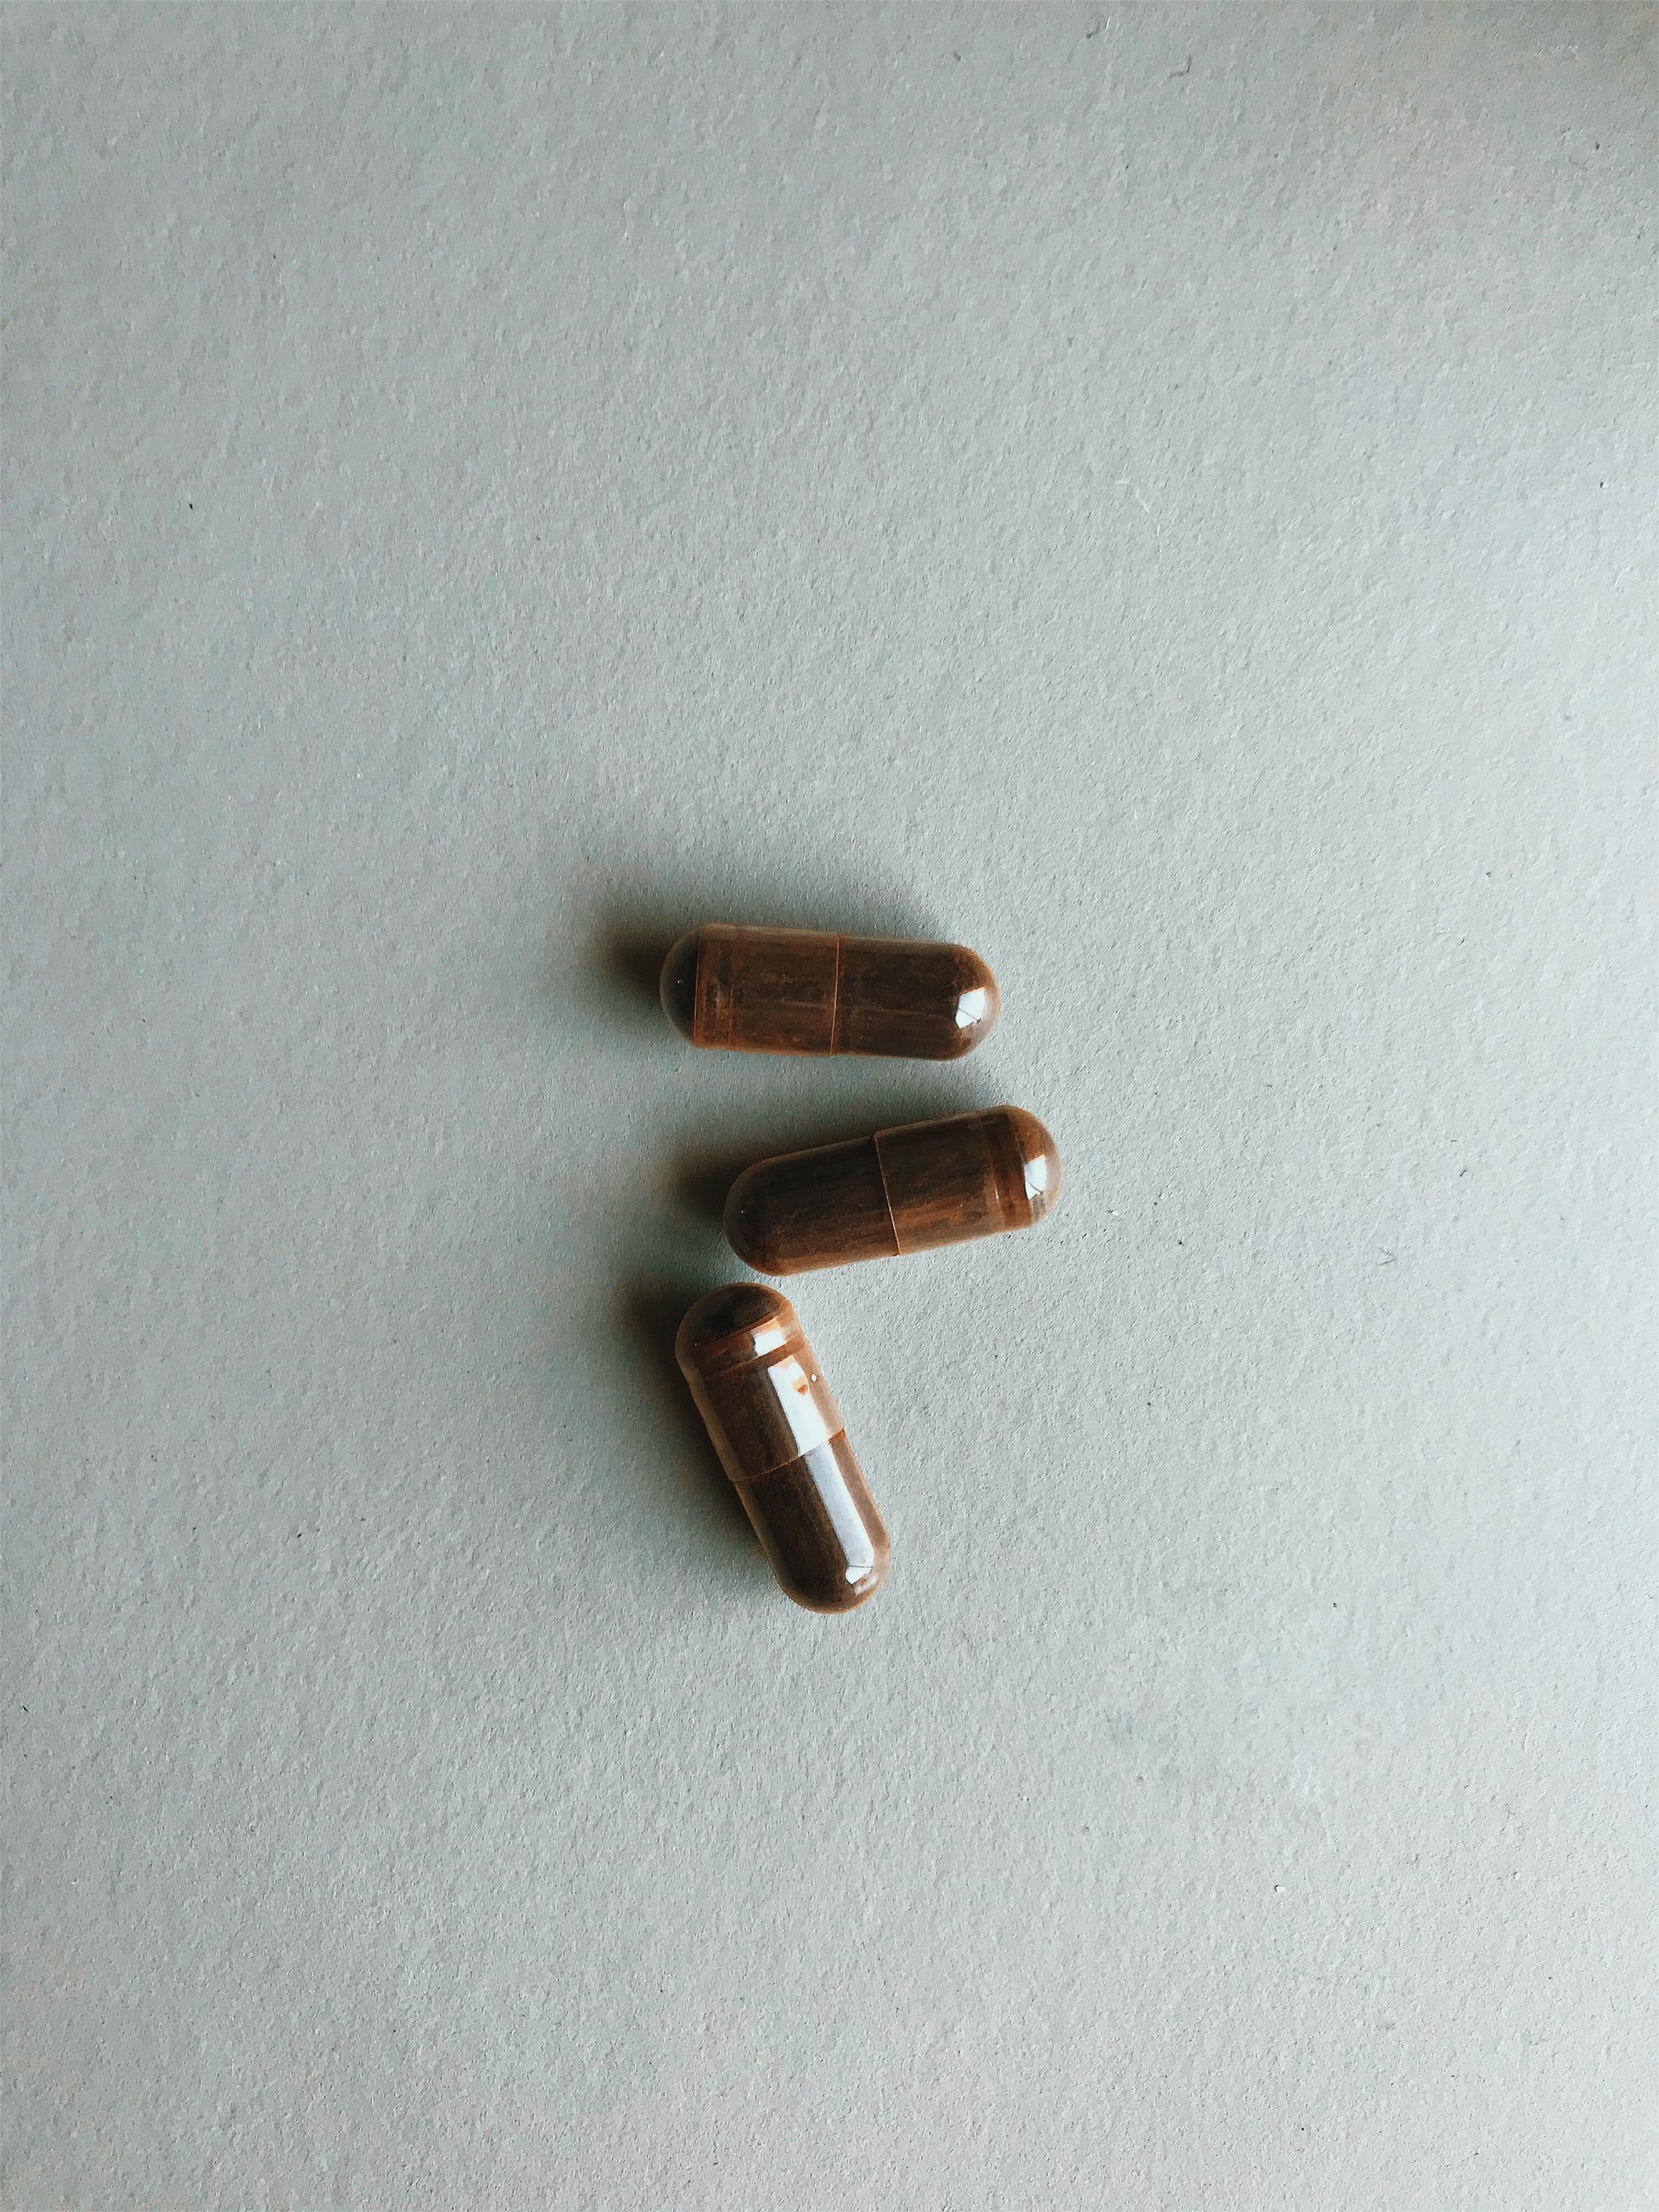 Chaga pills